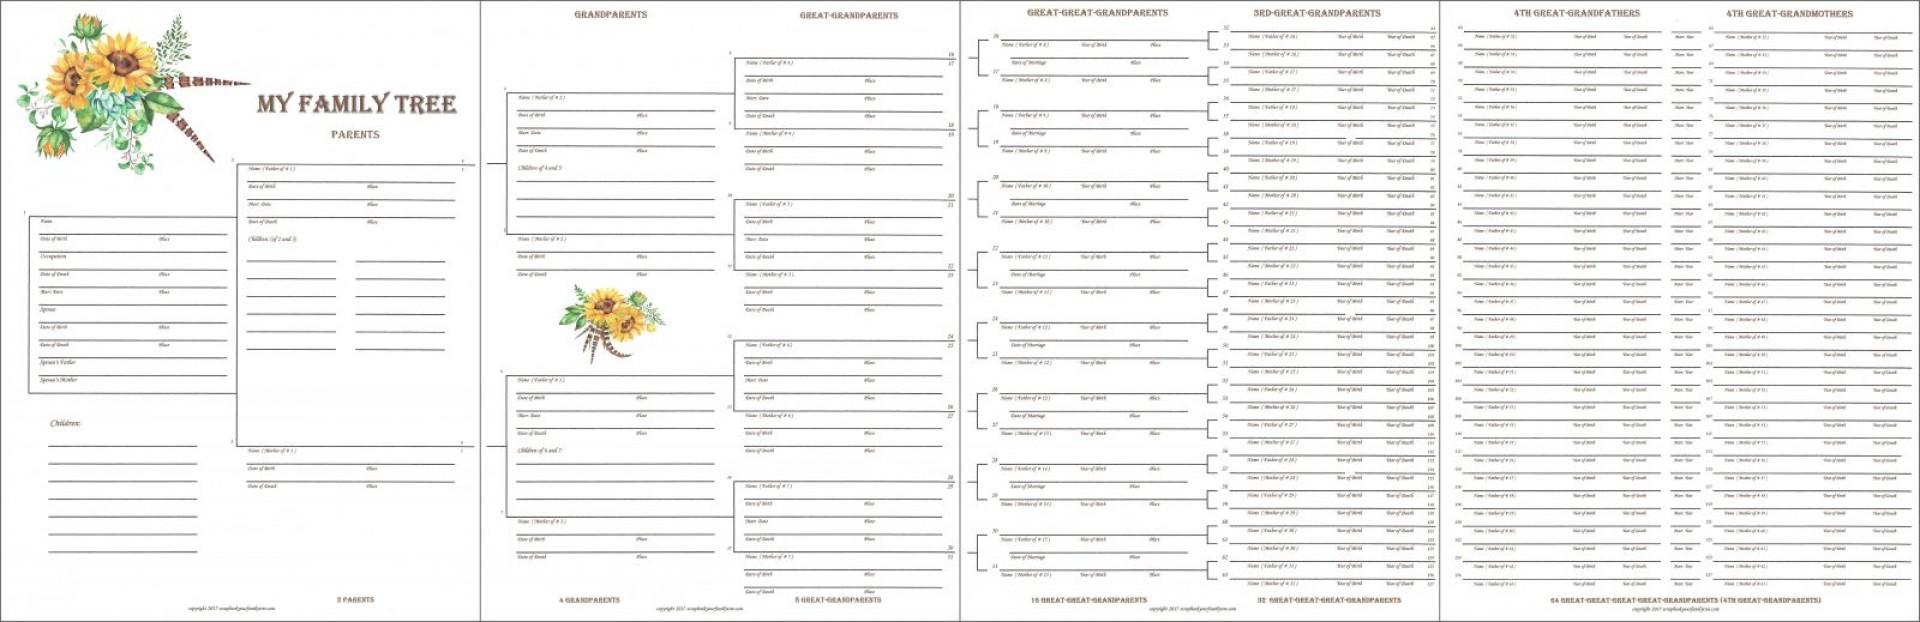 010 Unusual 7 Generation Family Tree Template Design  Blank Free Editable1920